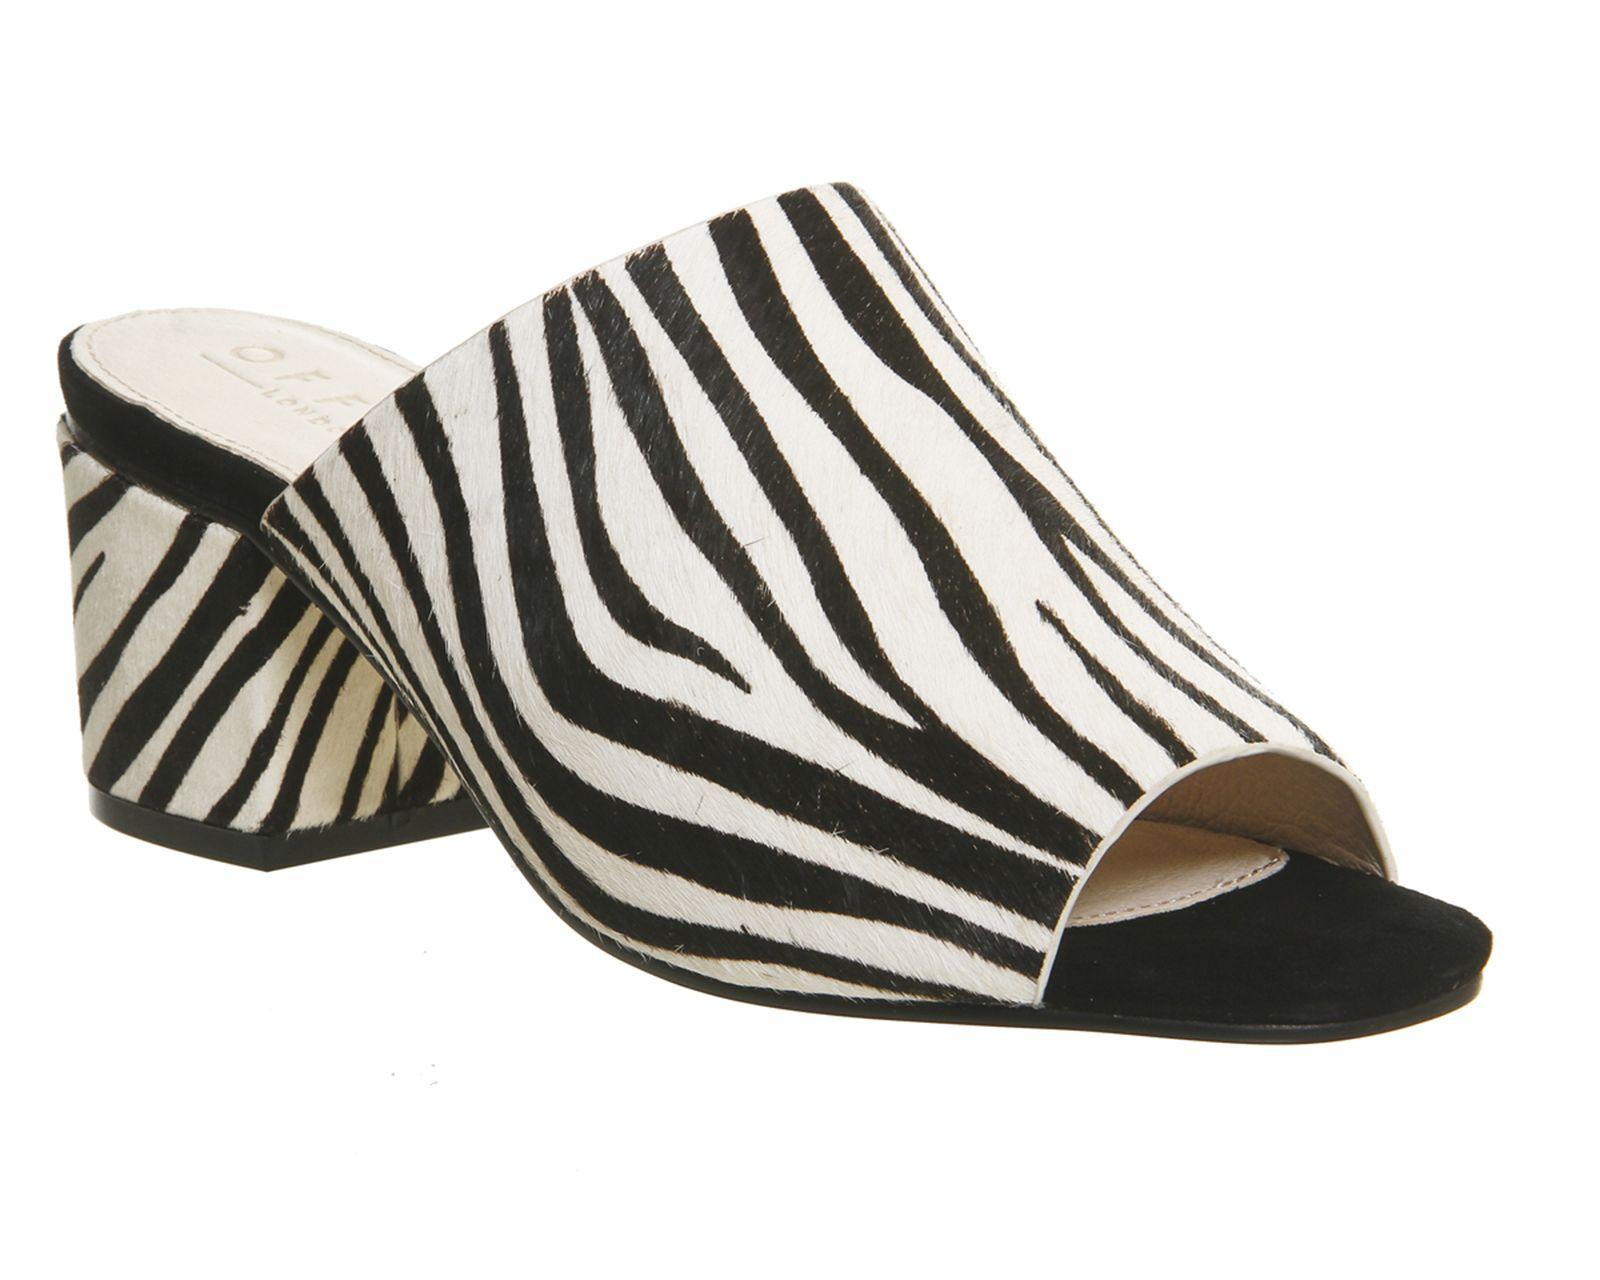 b0306b46c1ab Office Madness Block Heel Mules Zebra Pony Effect - Mid Heels